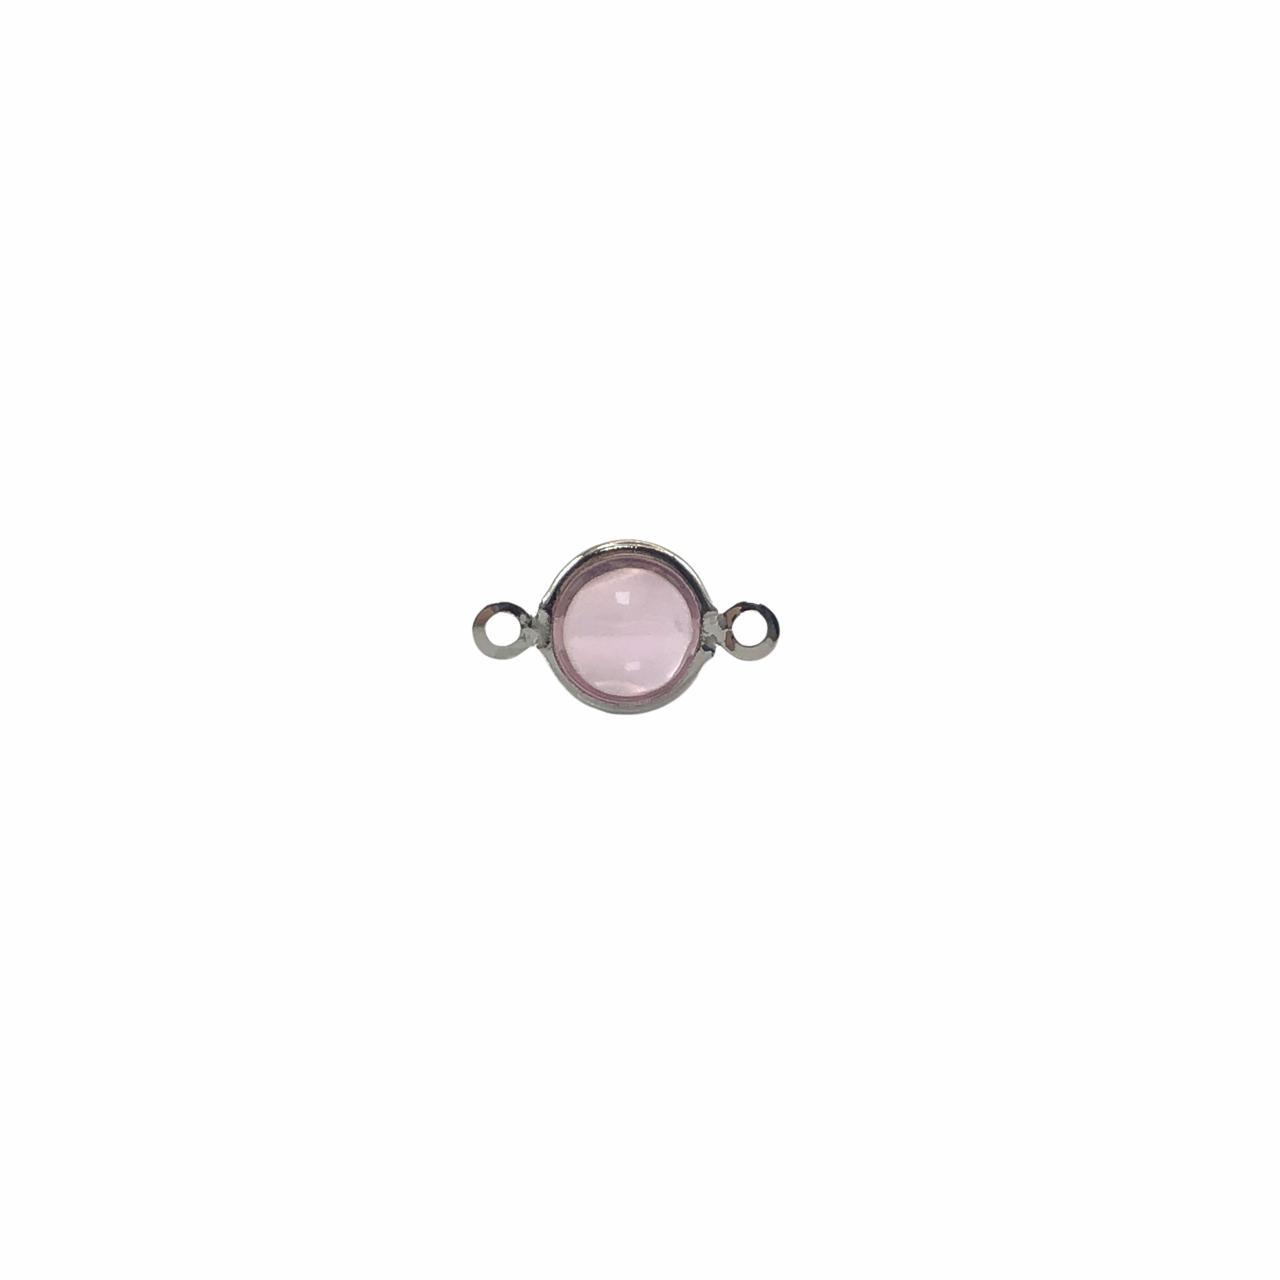 ETM578 - Entremeio De Vidro Light Rose 8mm Banhado Cor Prata - 4Unids